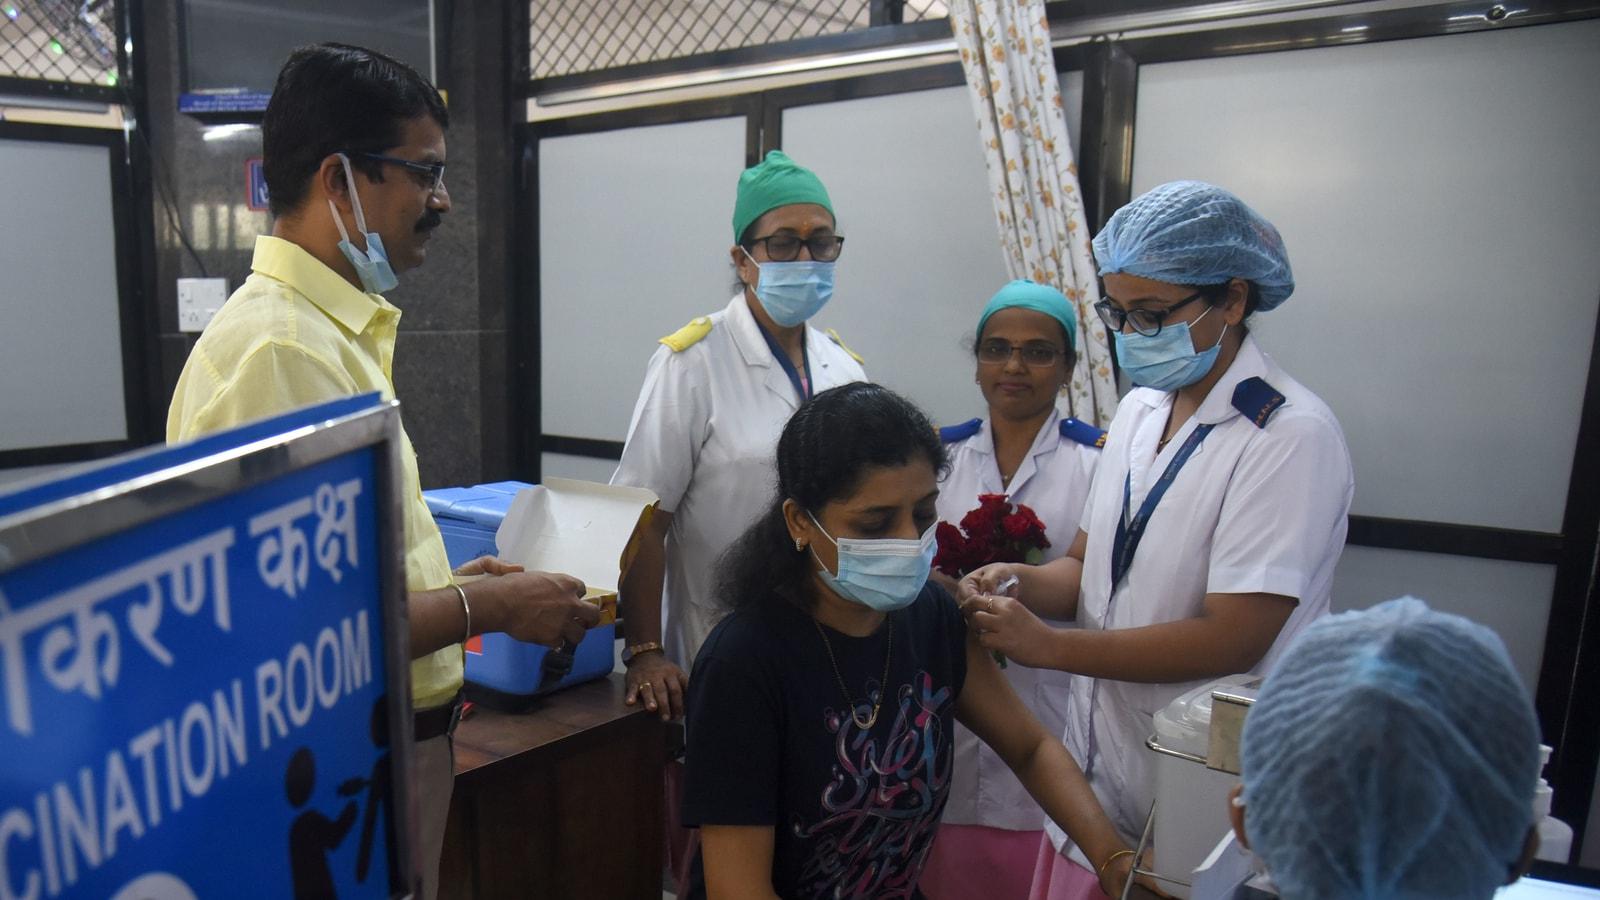 Maharashtra's death toll breaches 140k mark, amid dip in Covid fatalities